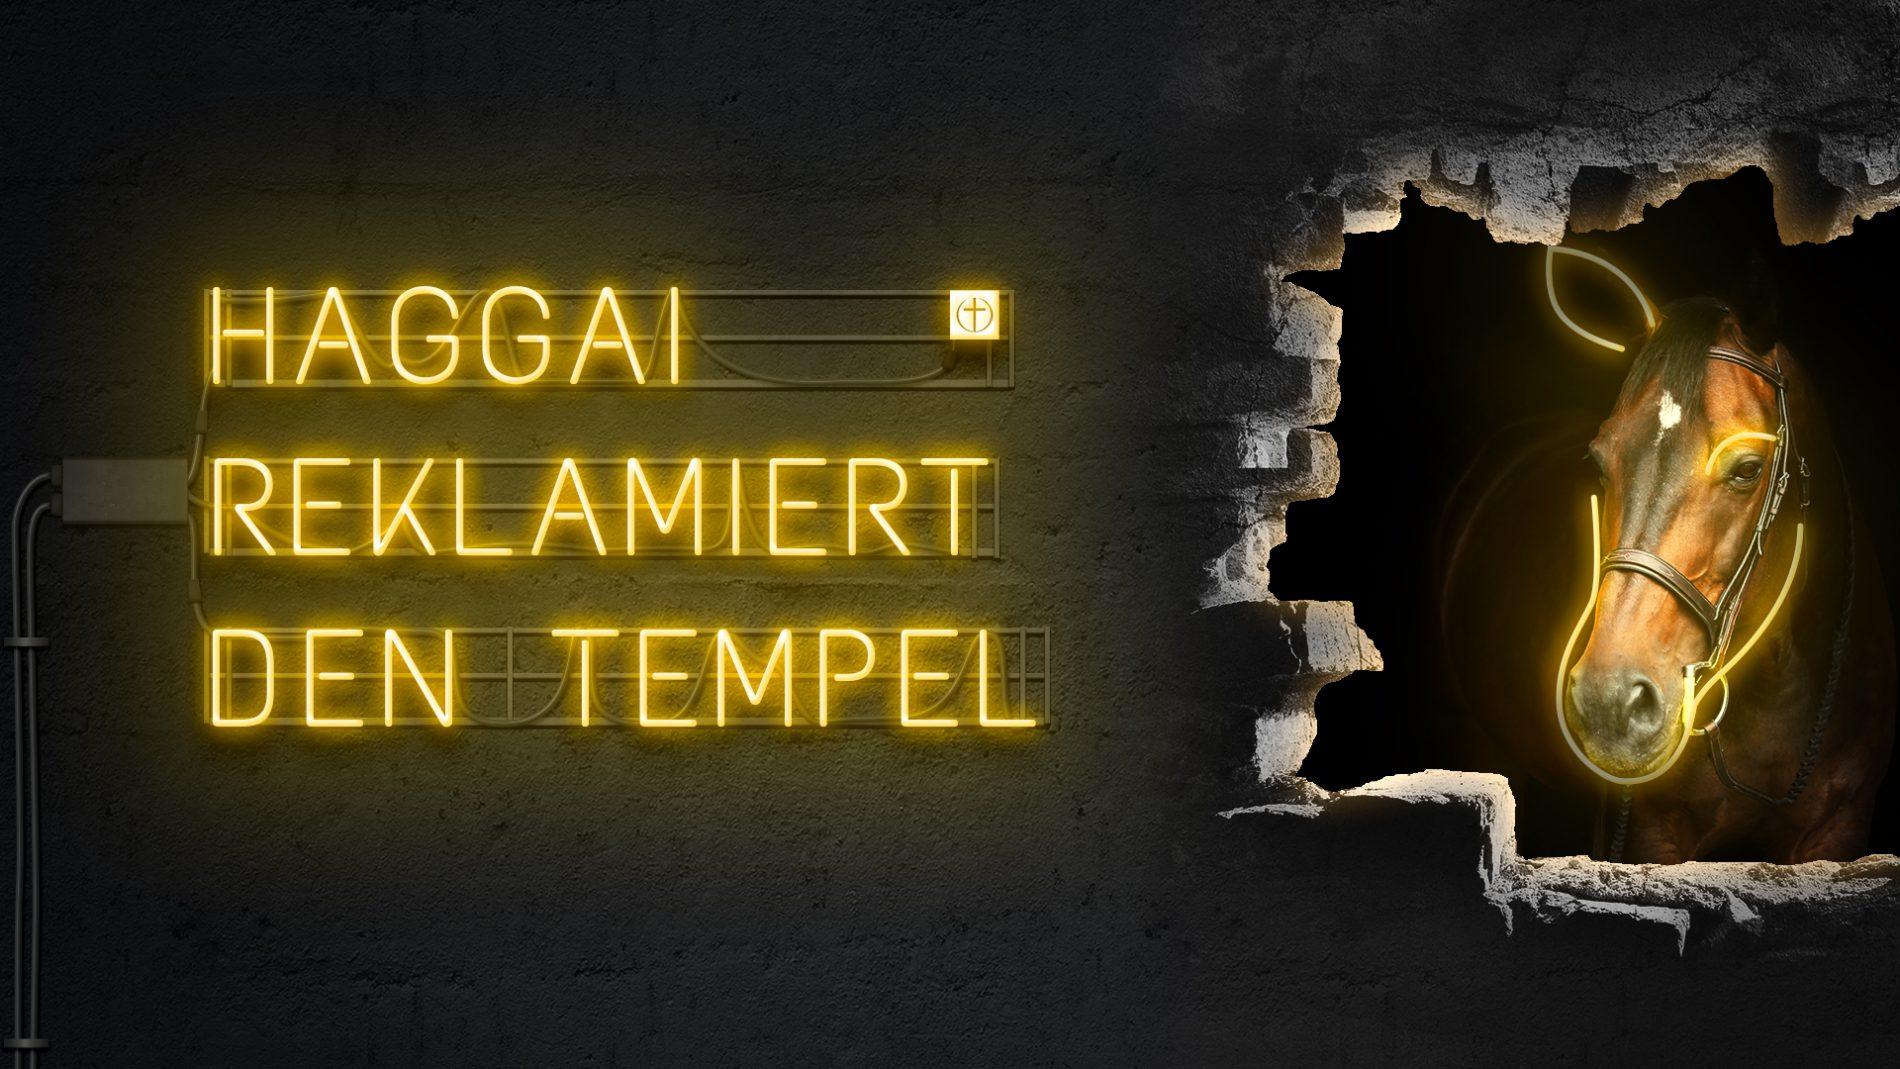 Haggai reklamiert den Tempel (Zwölf Propheten X)